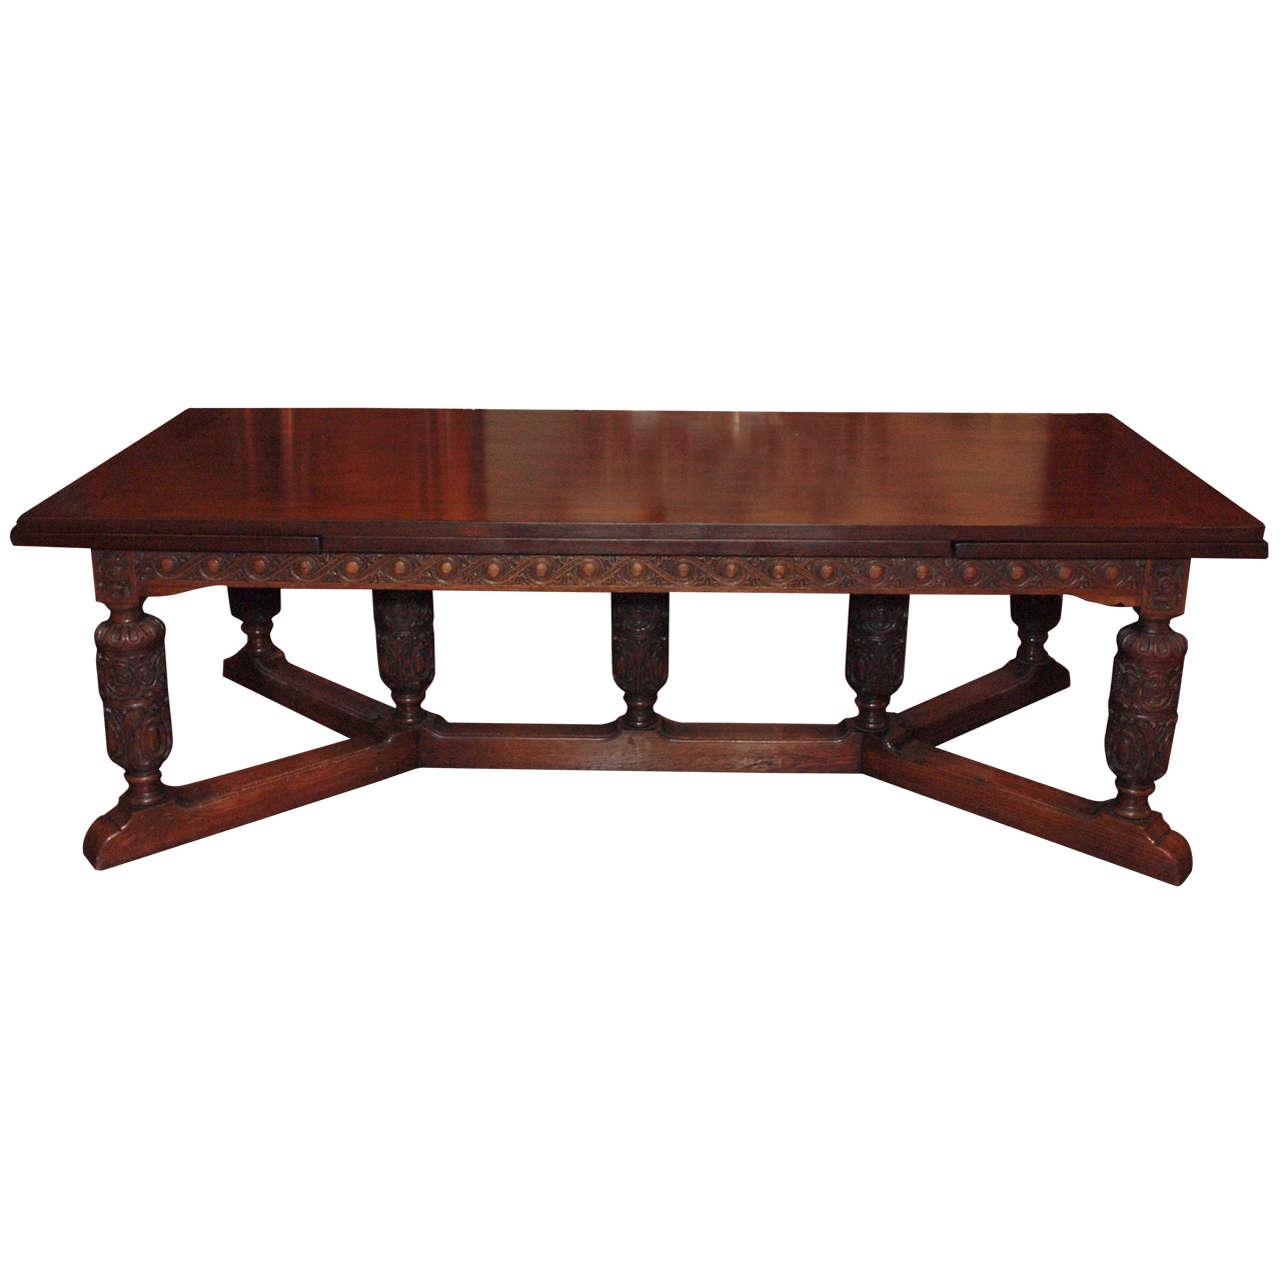 Antique English Oak Trestle Table circa 1880 at 1stdibs : X from www.1stdibs.com size 1281 x 1280 jpeg 67kB